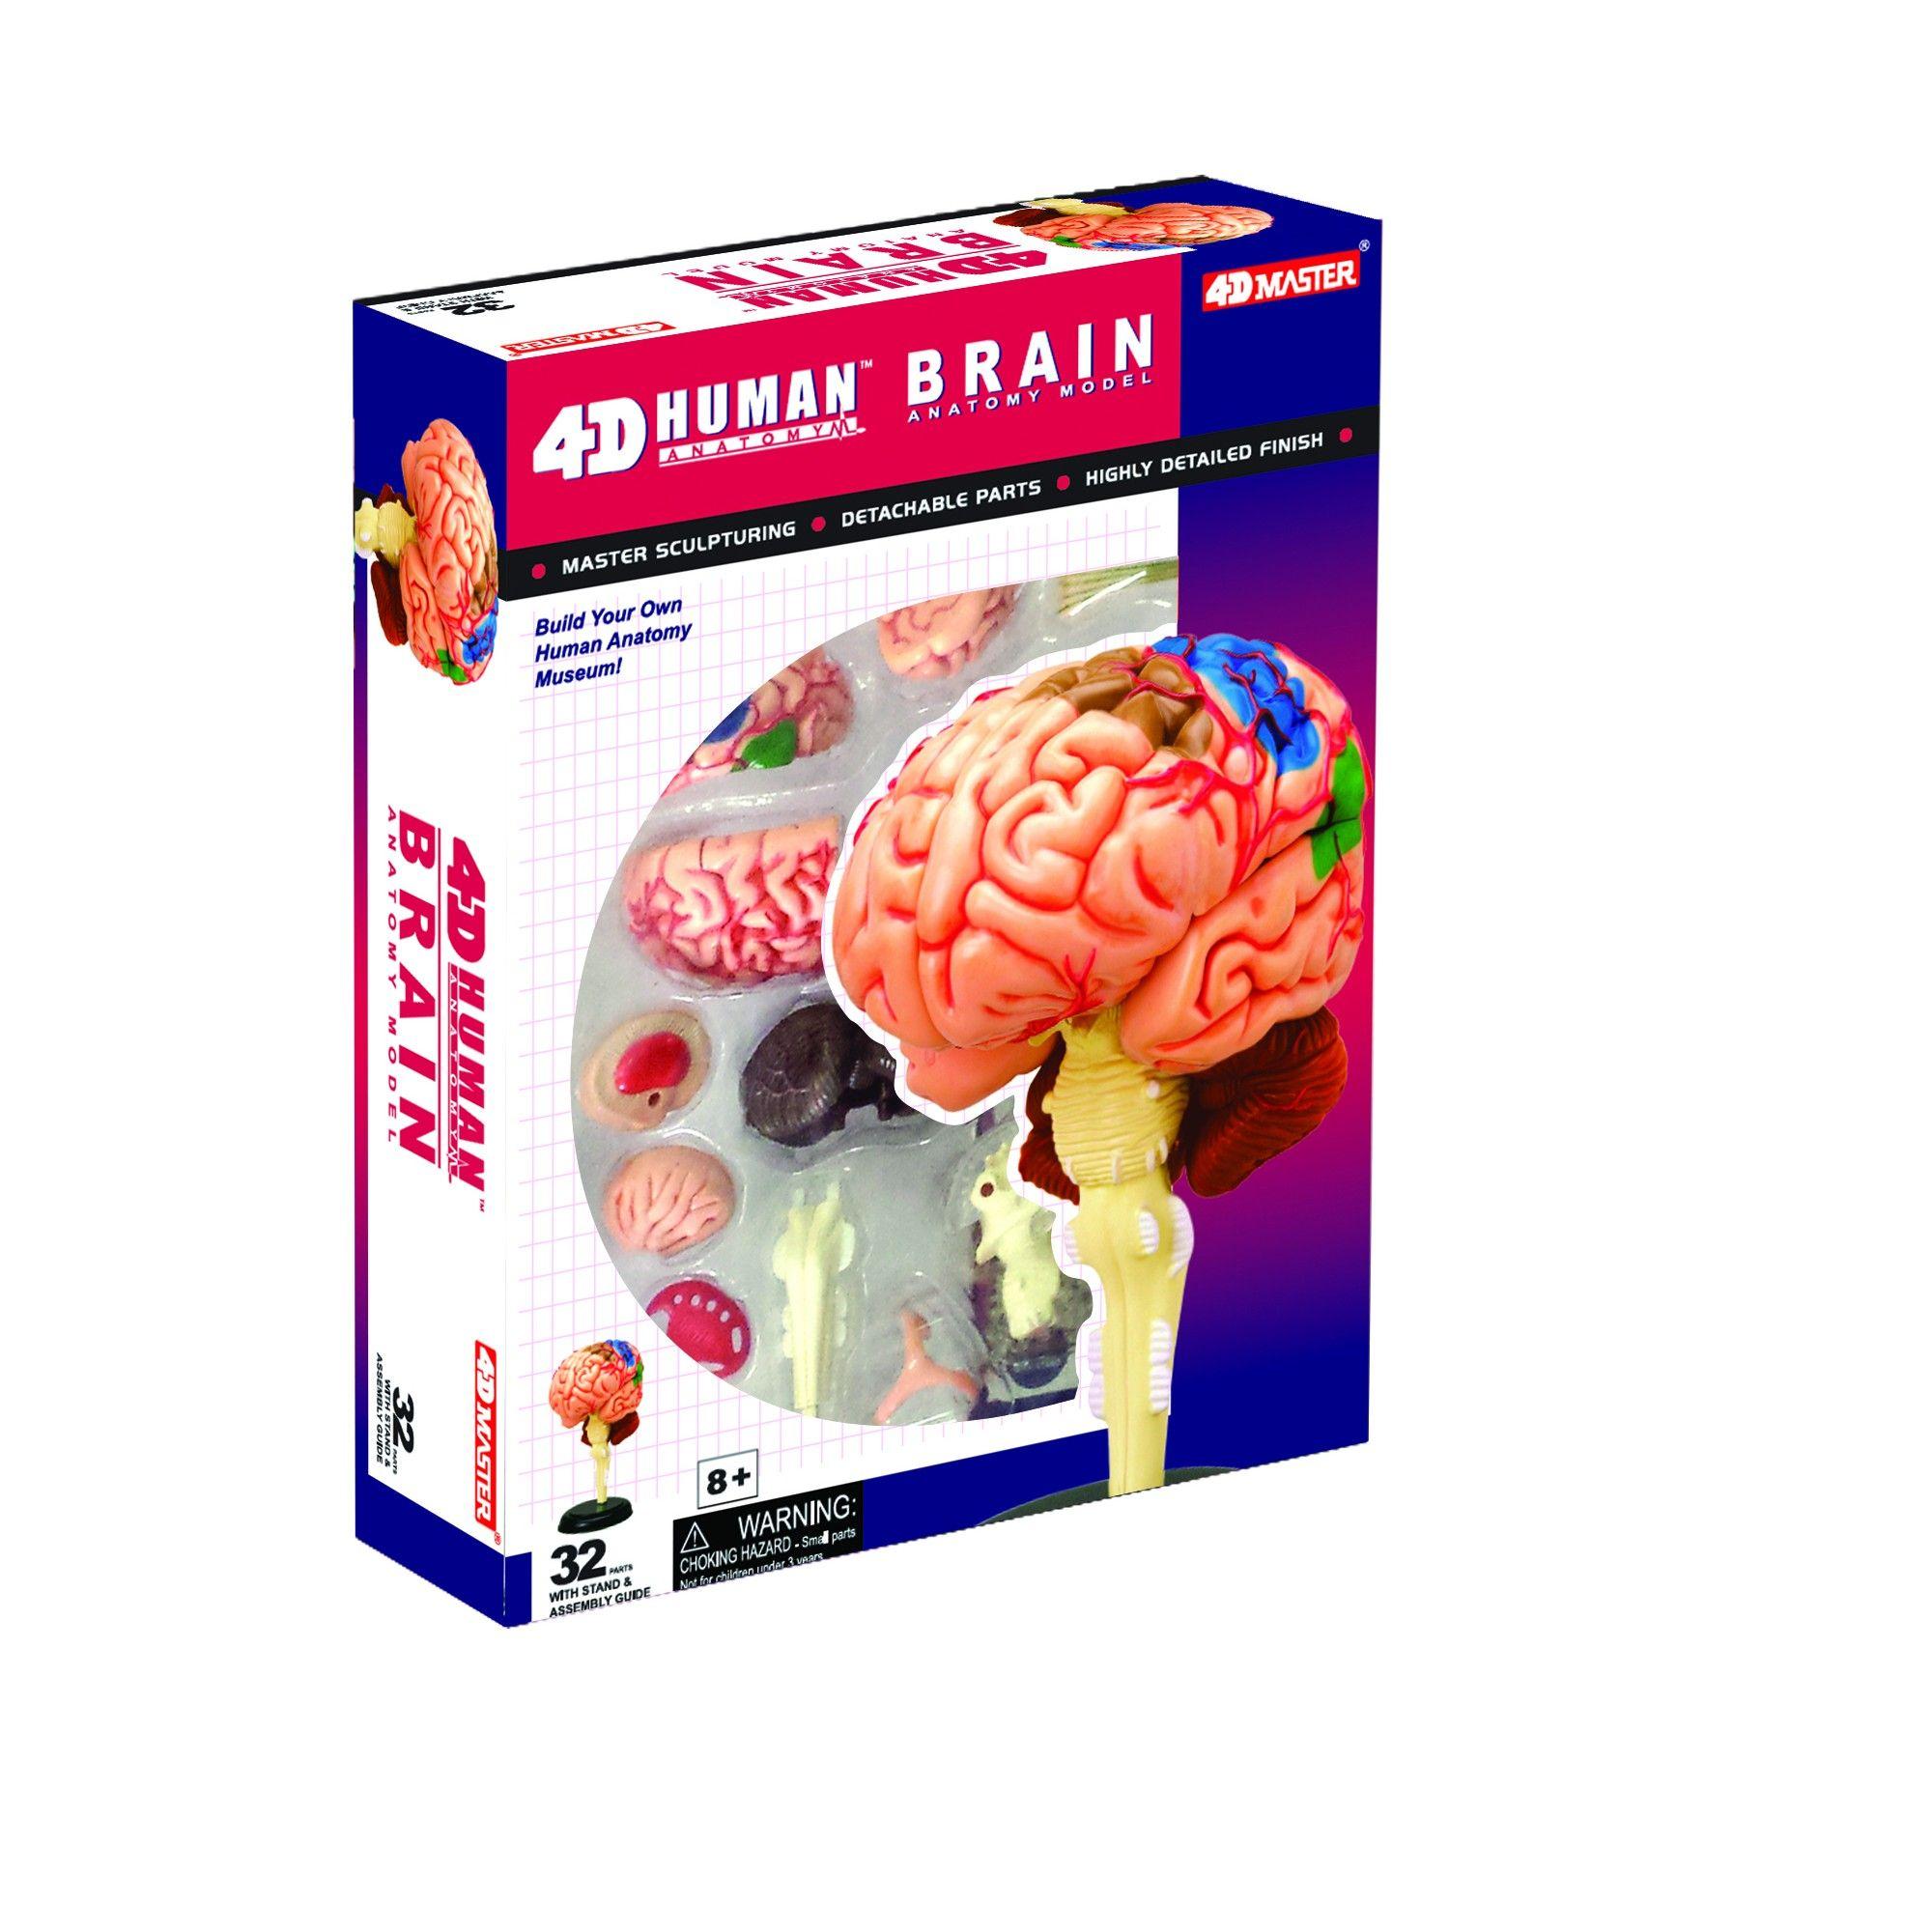 4D Brain Anatomy Model, Anatomy and Biology Kits | Brain anatomy ...